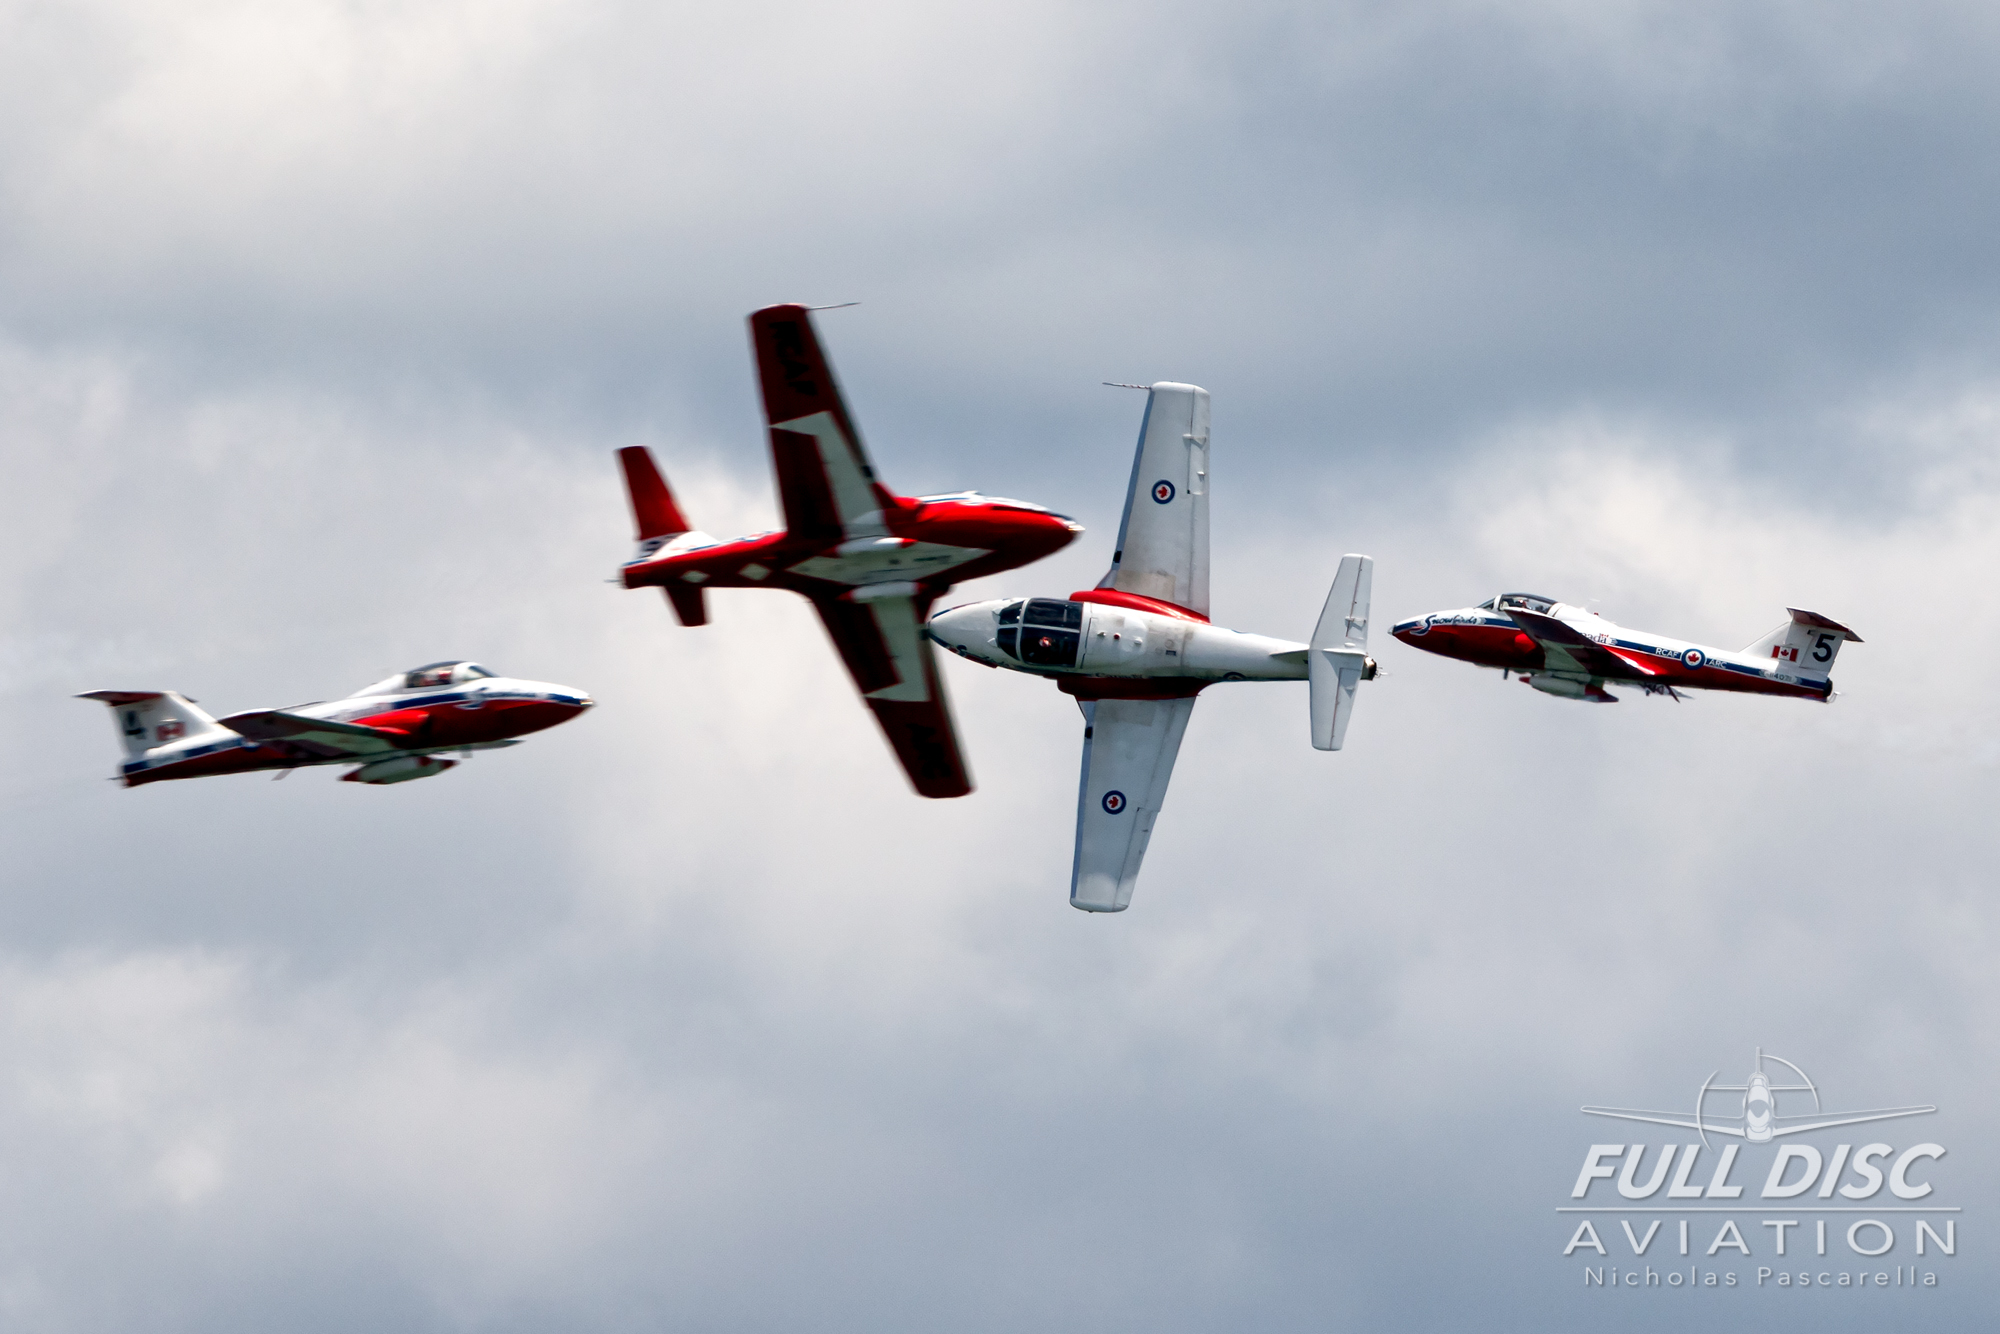 nickpascarella_fulldiscaviation_oceancityairshow_aviation_snowbirds_fourship_cross.jpg